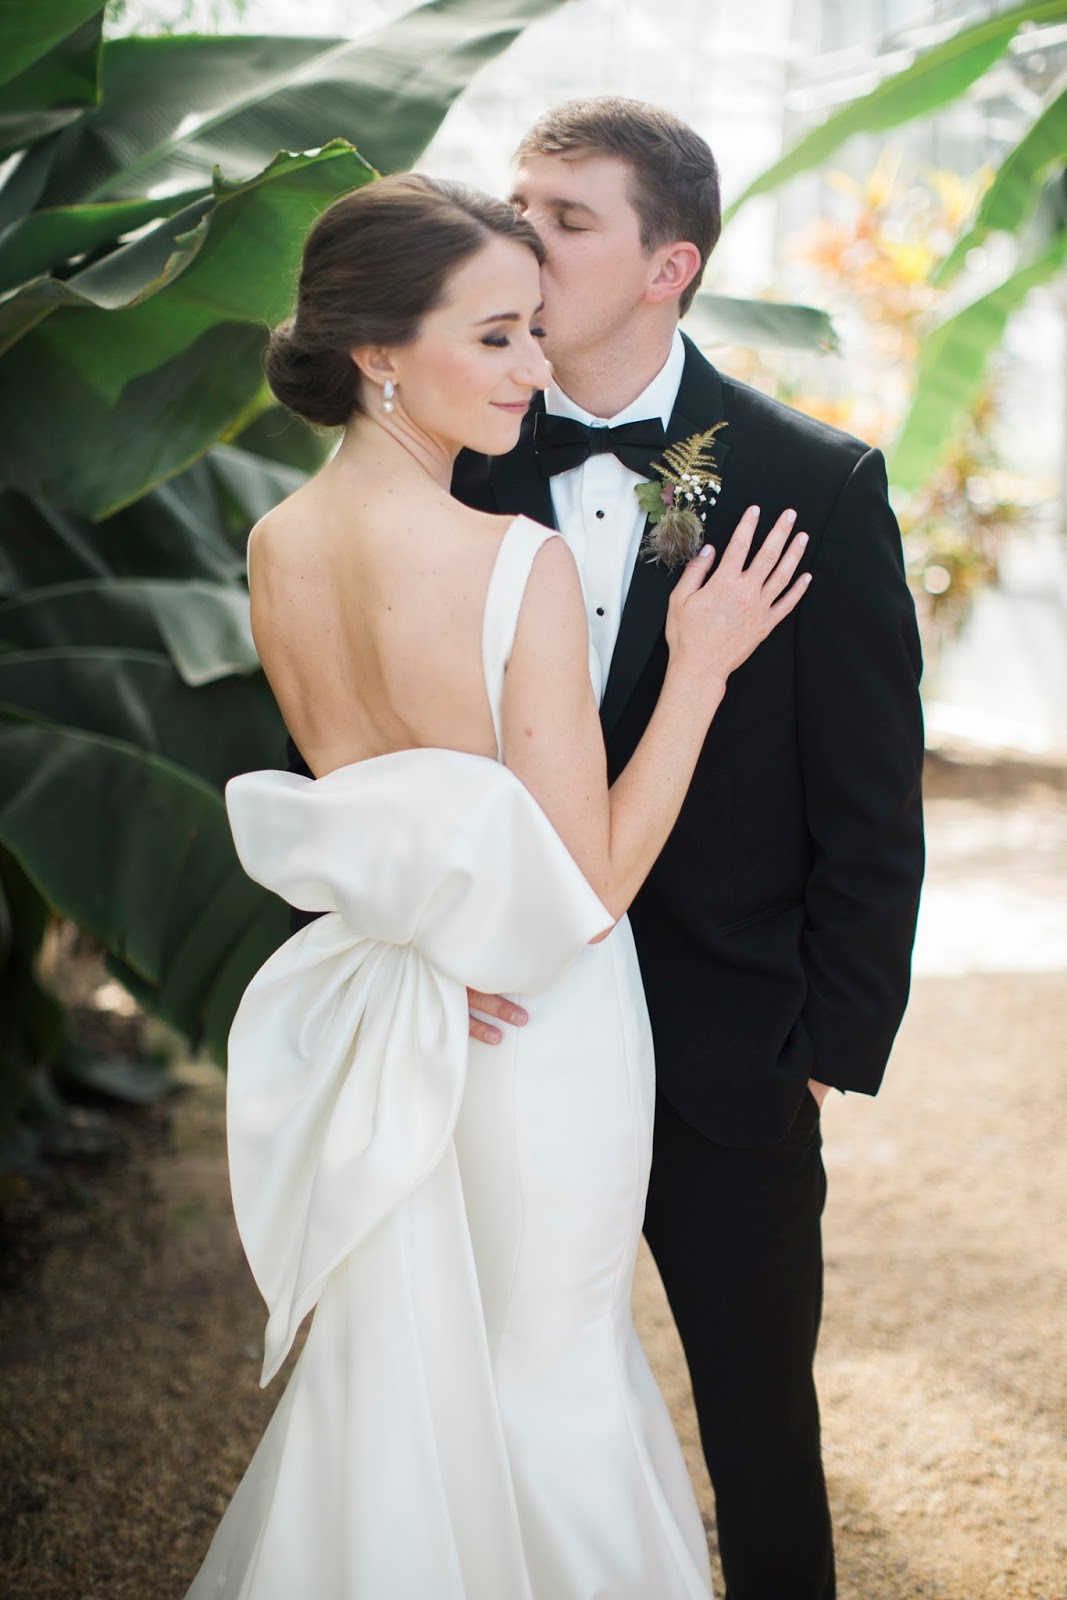 191_Maggie & Charlie Wedding.jpg